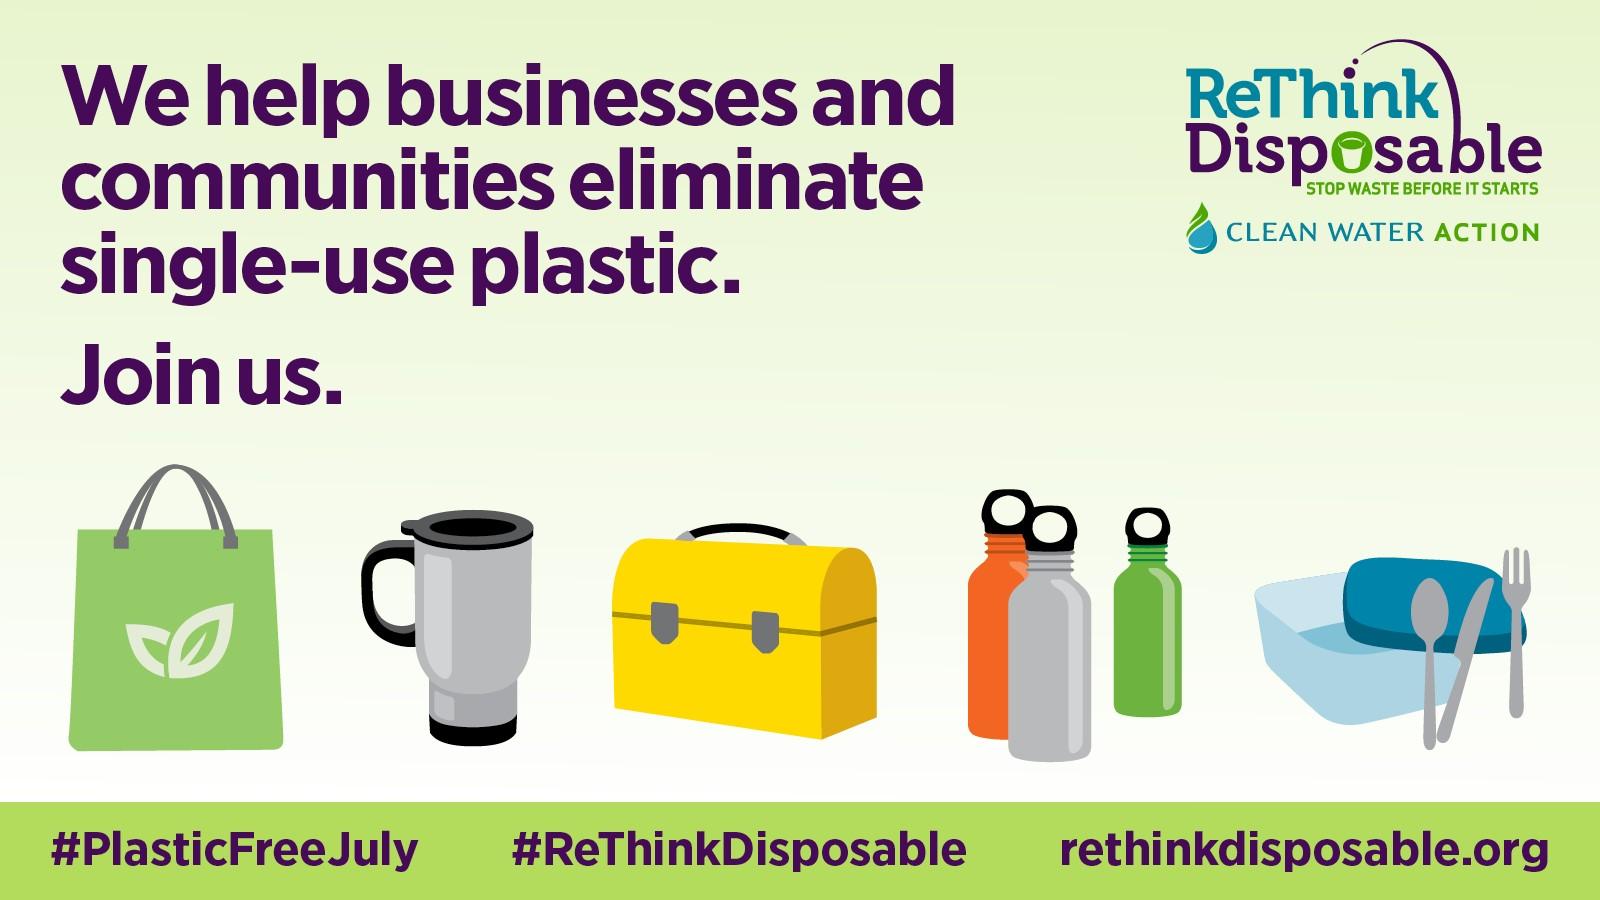 ReThink Disposable_Plastic Free July 2019_Program_Twitter.jpg